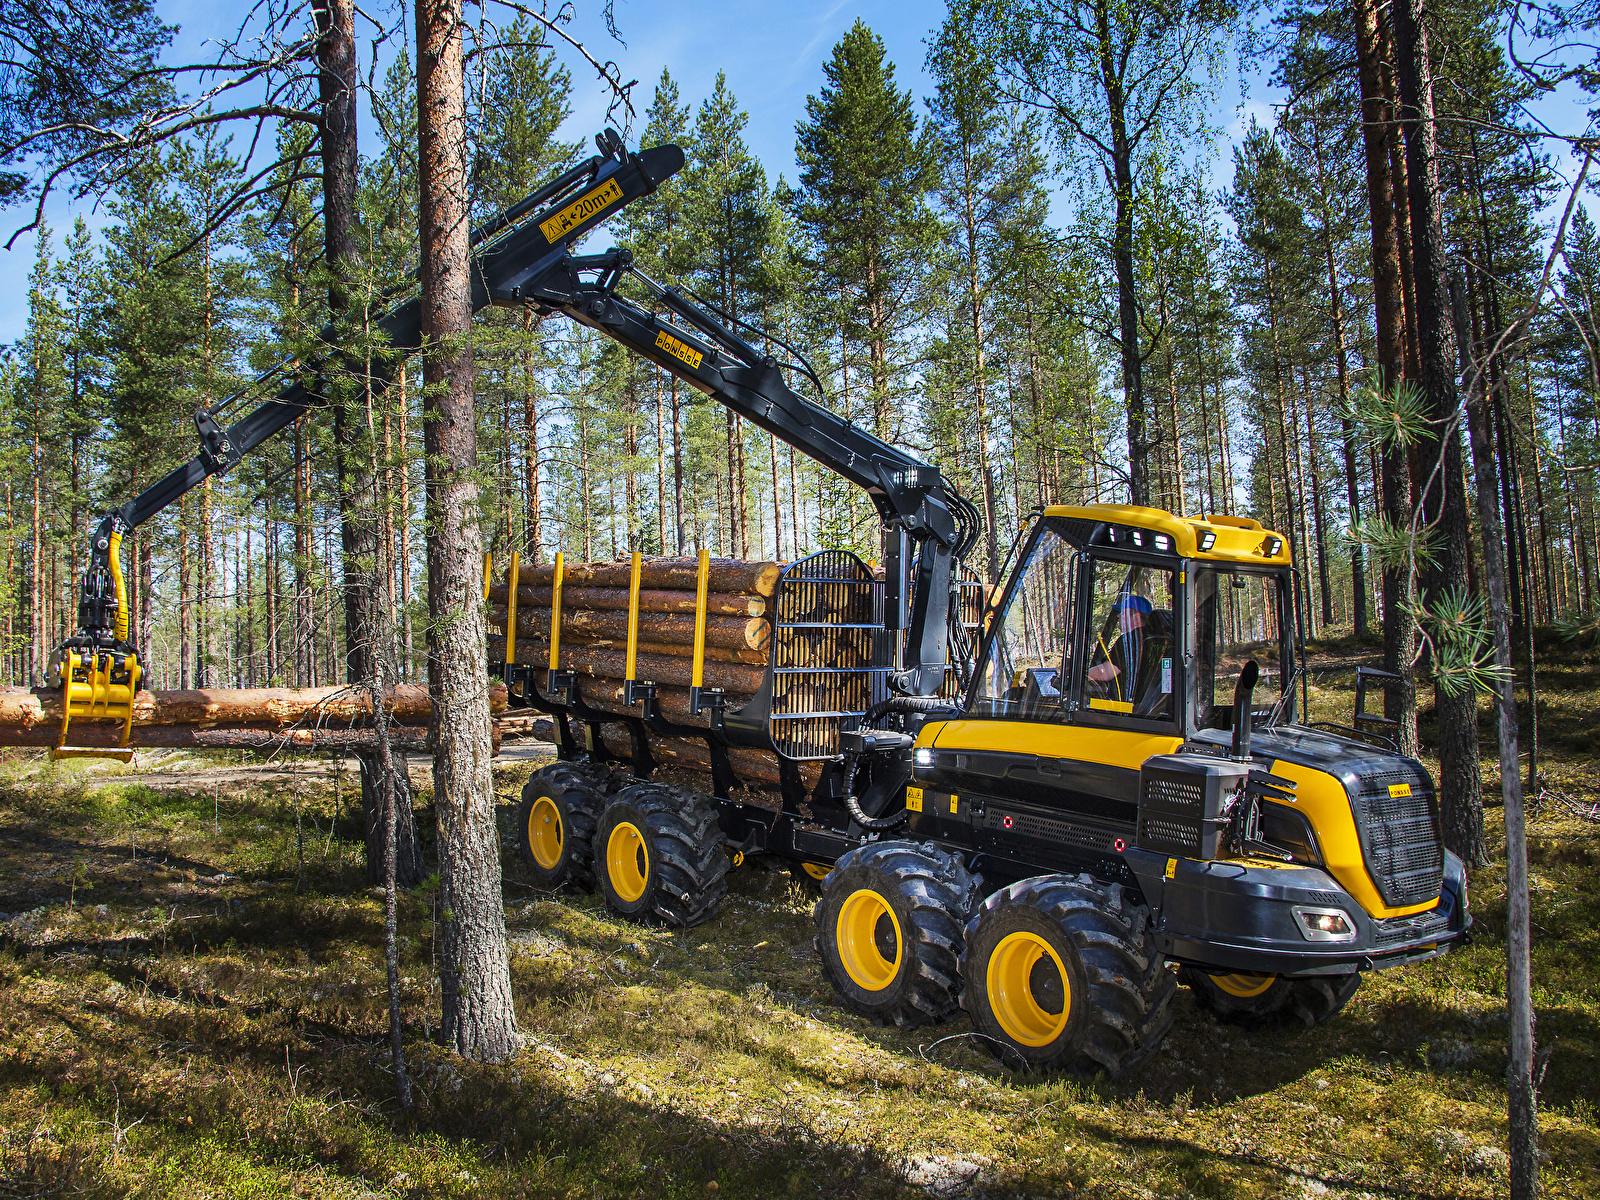 Фотографии Форвардер 2014-17 Ponsse Wisent 8w бревно лес 1600x1200 Бревна Леса